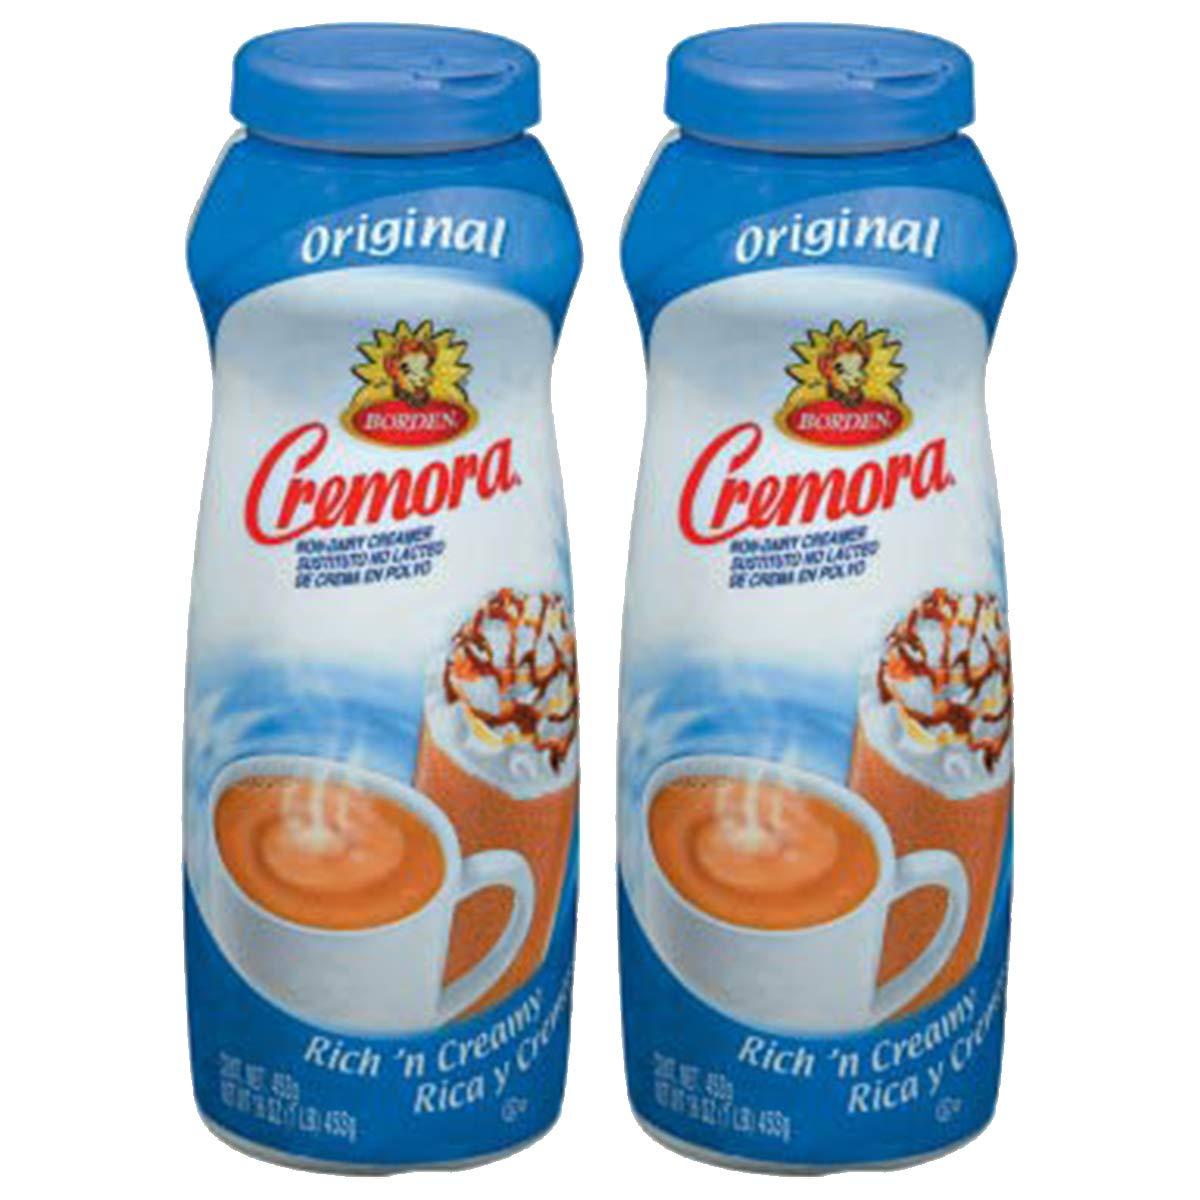 Borden Coffee Creamer Non-Dairy OFFicial Powdered Cremora Cash special price 16 Original oz.